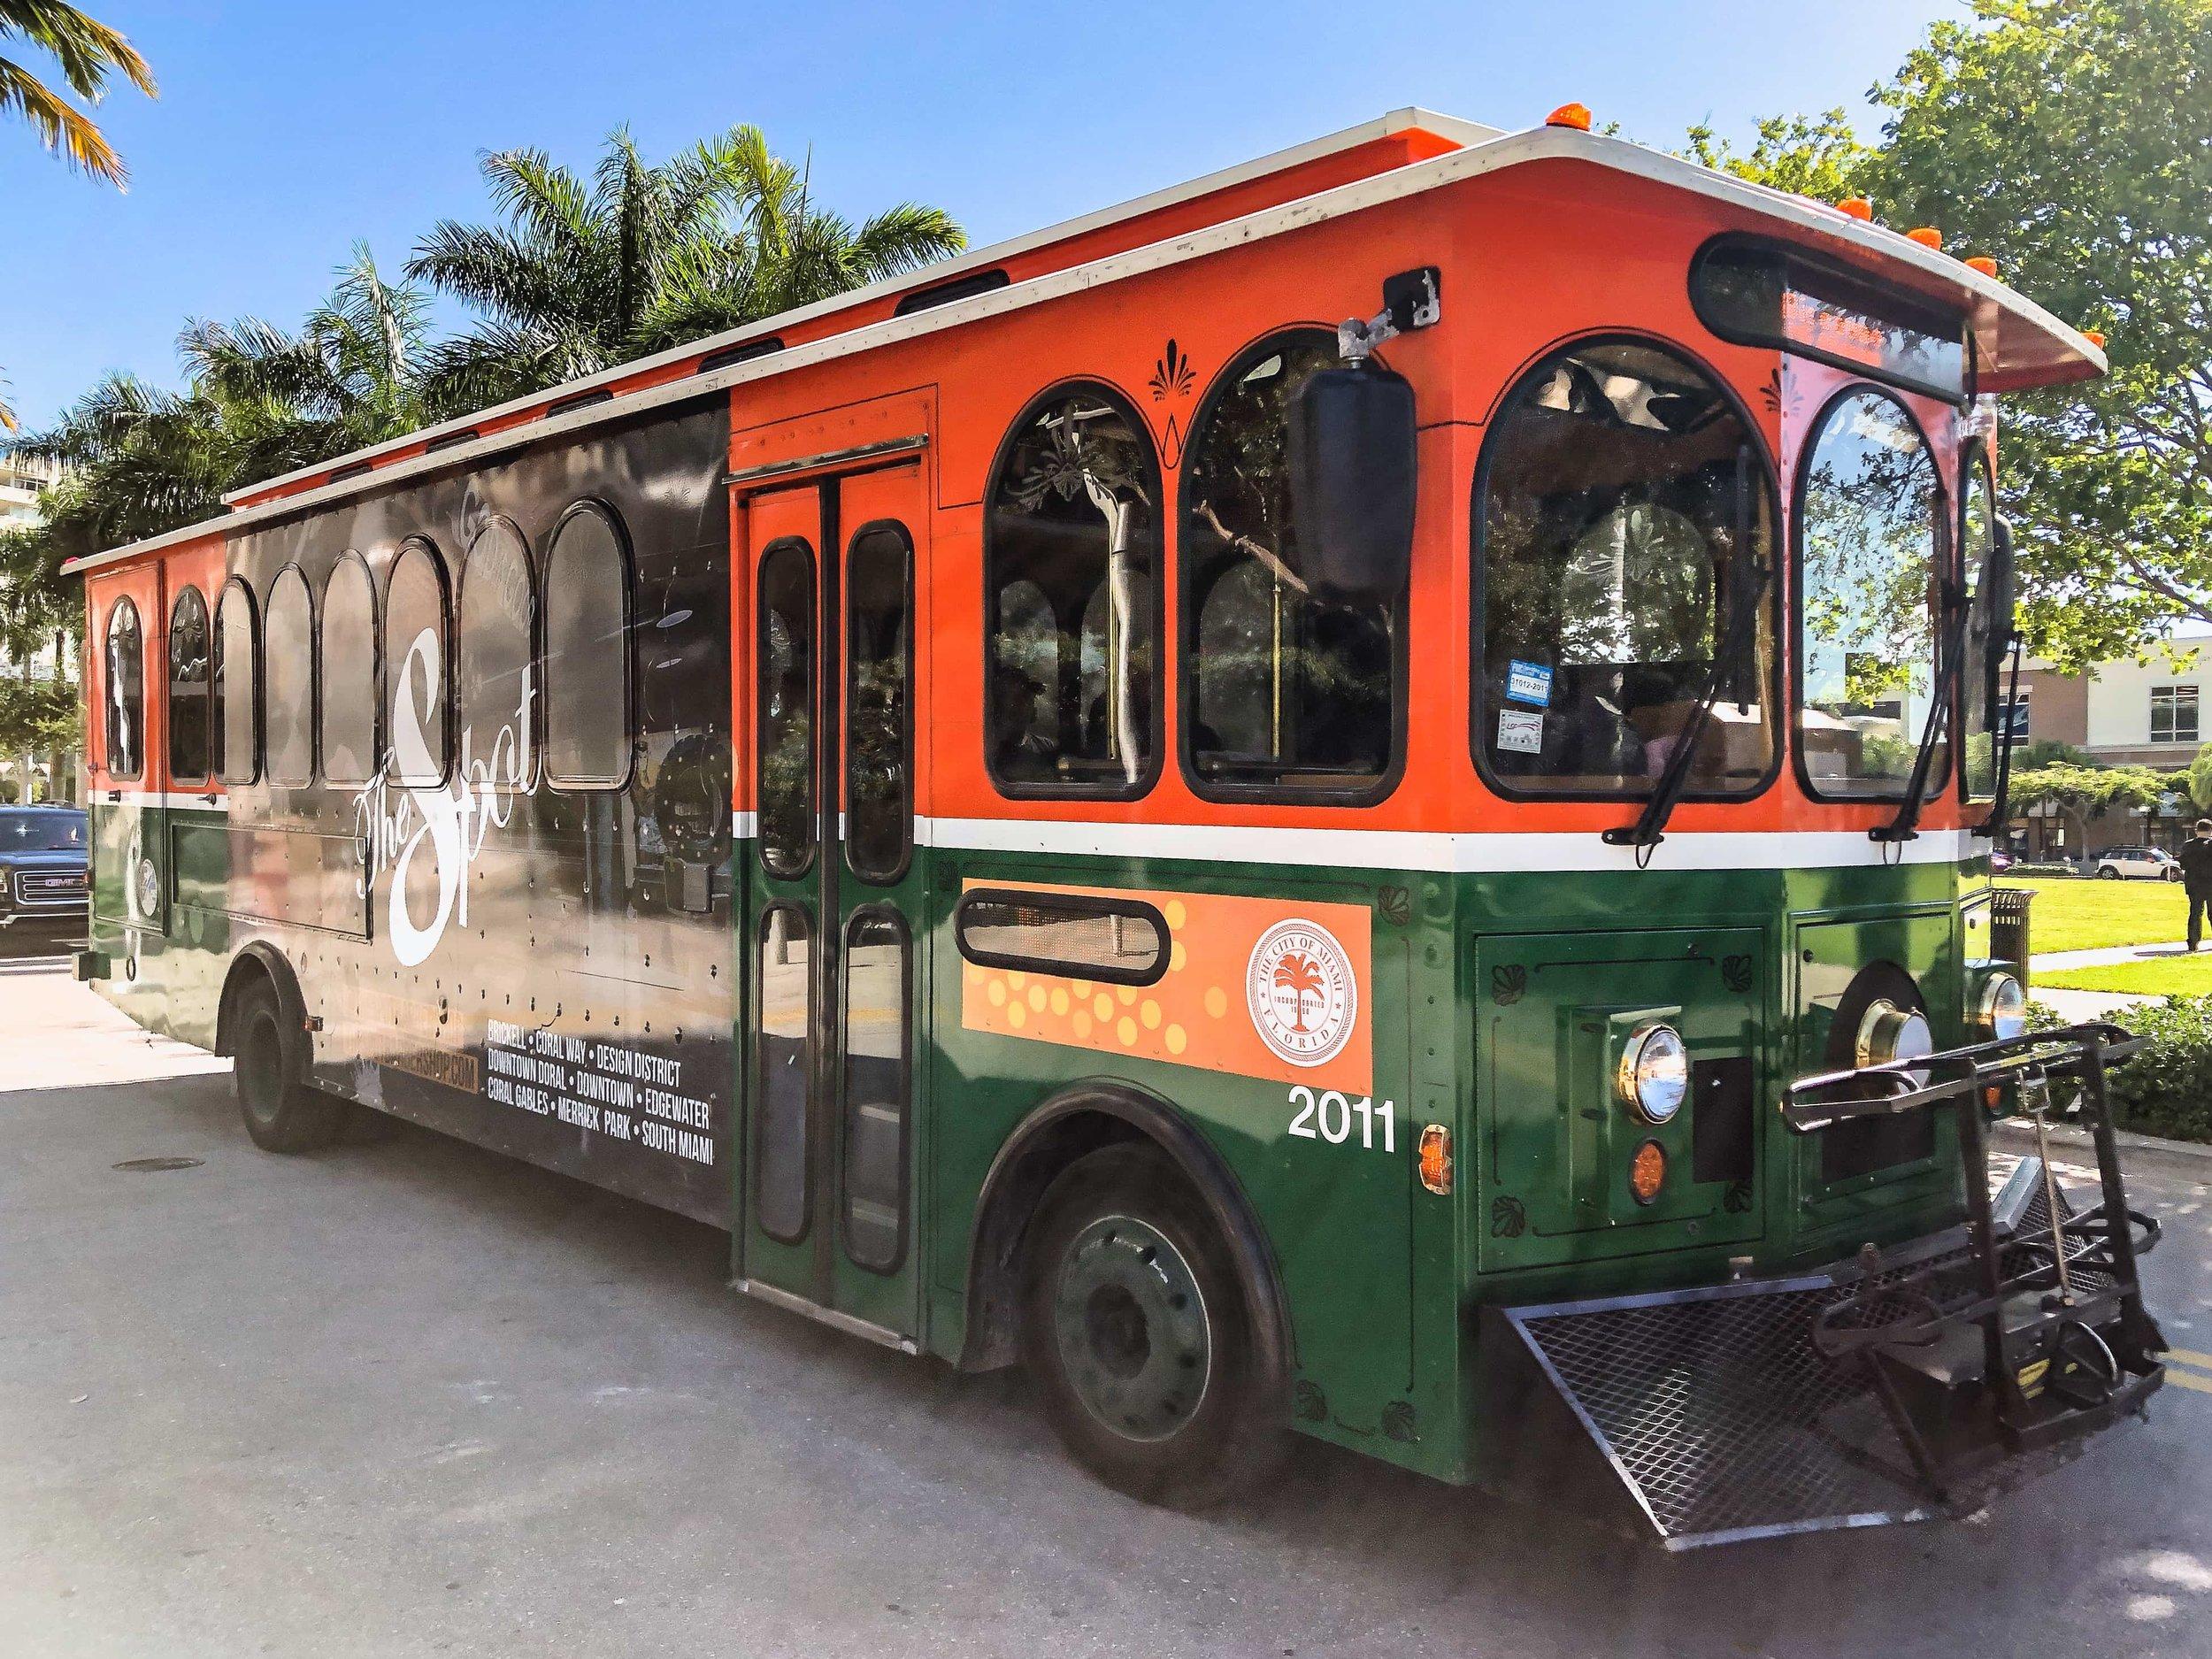 Miami Trolley, Brickell, <Travelhund>